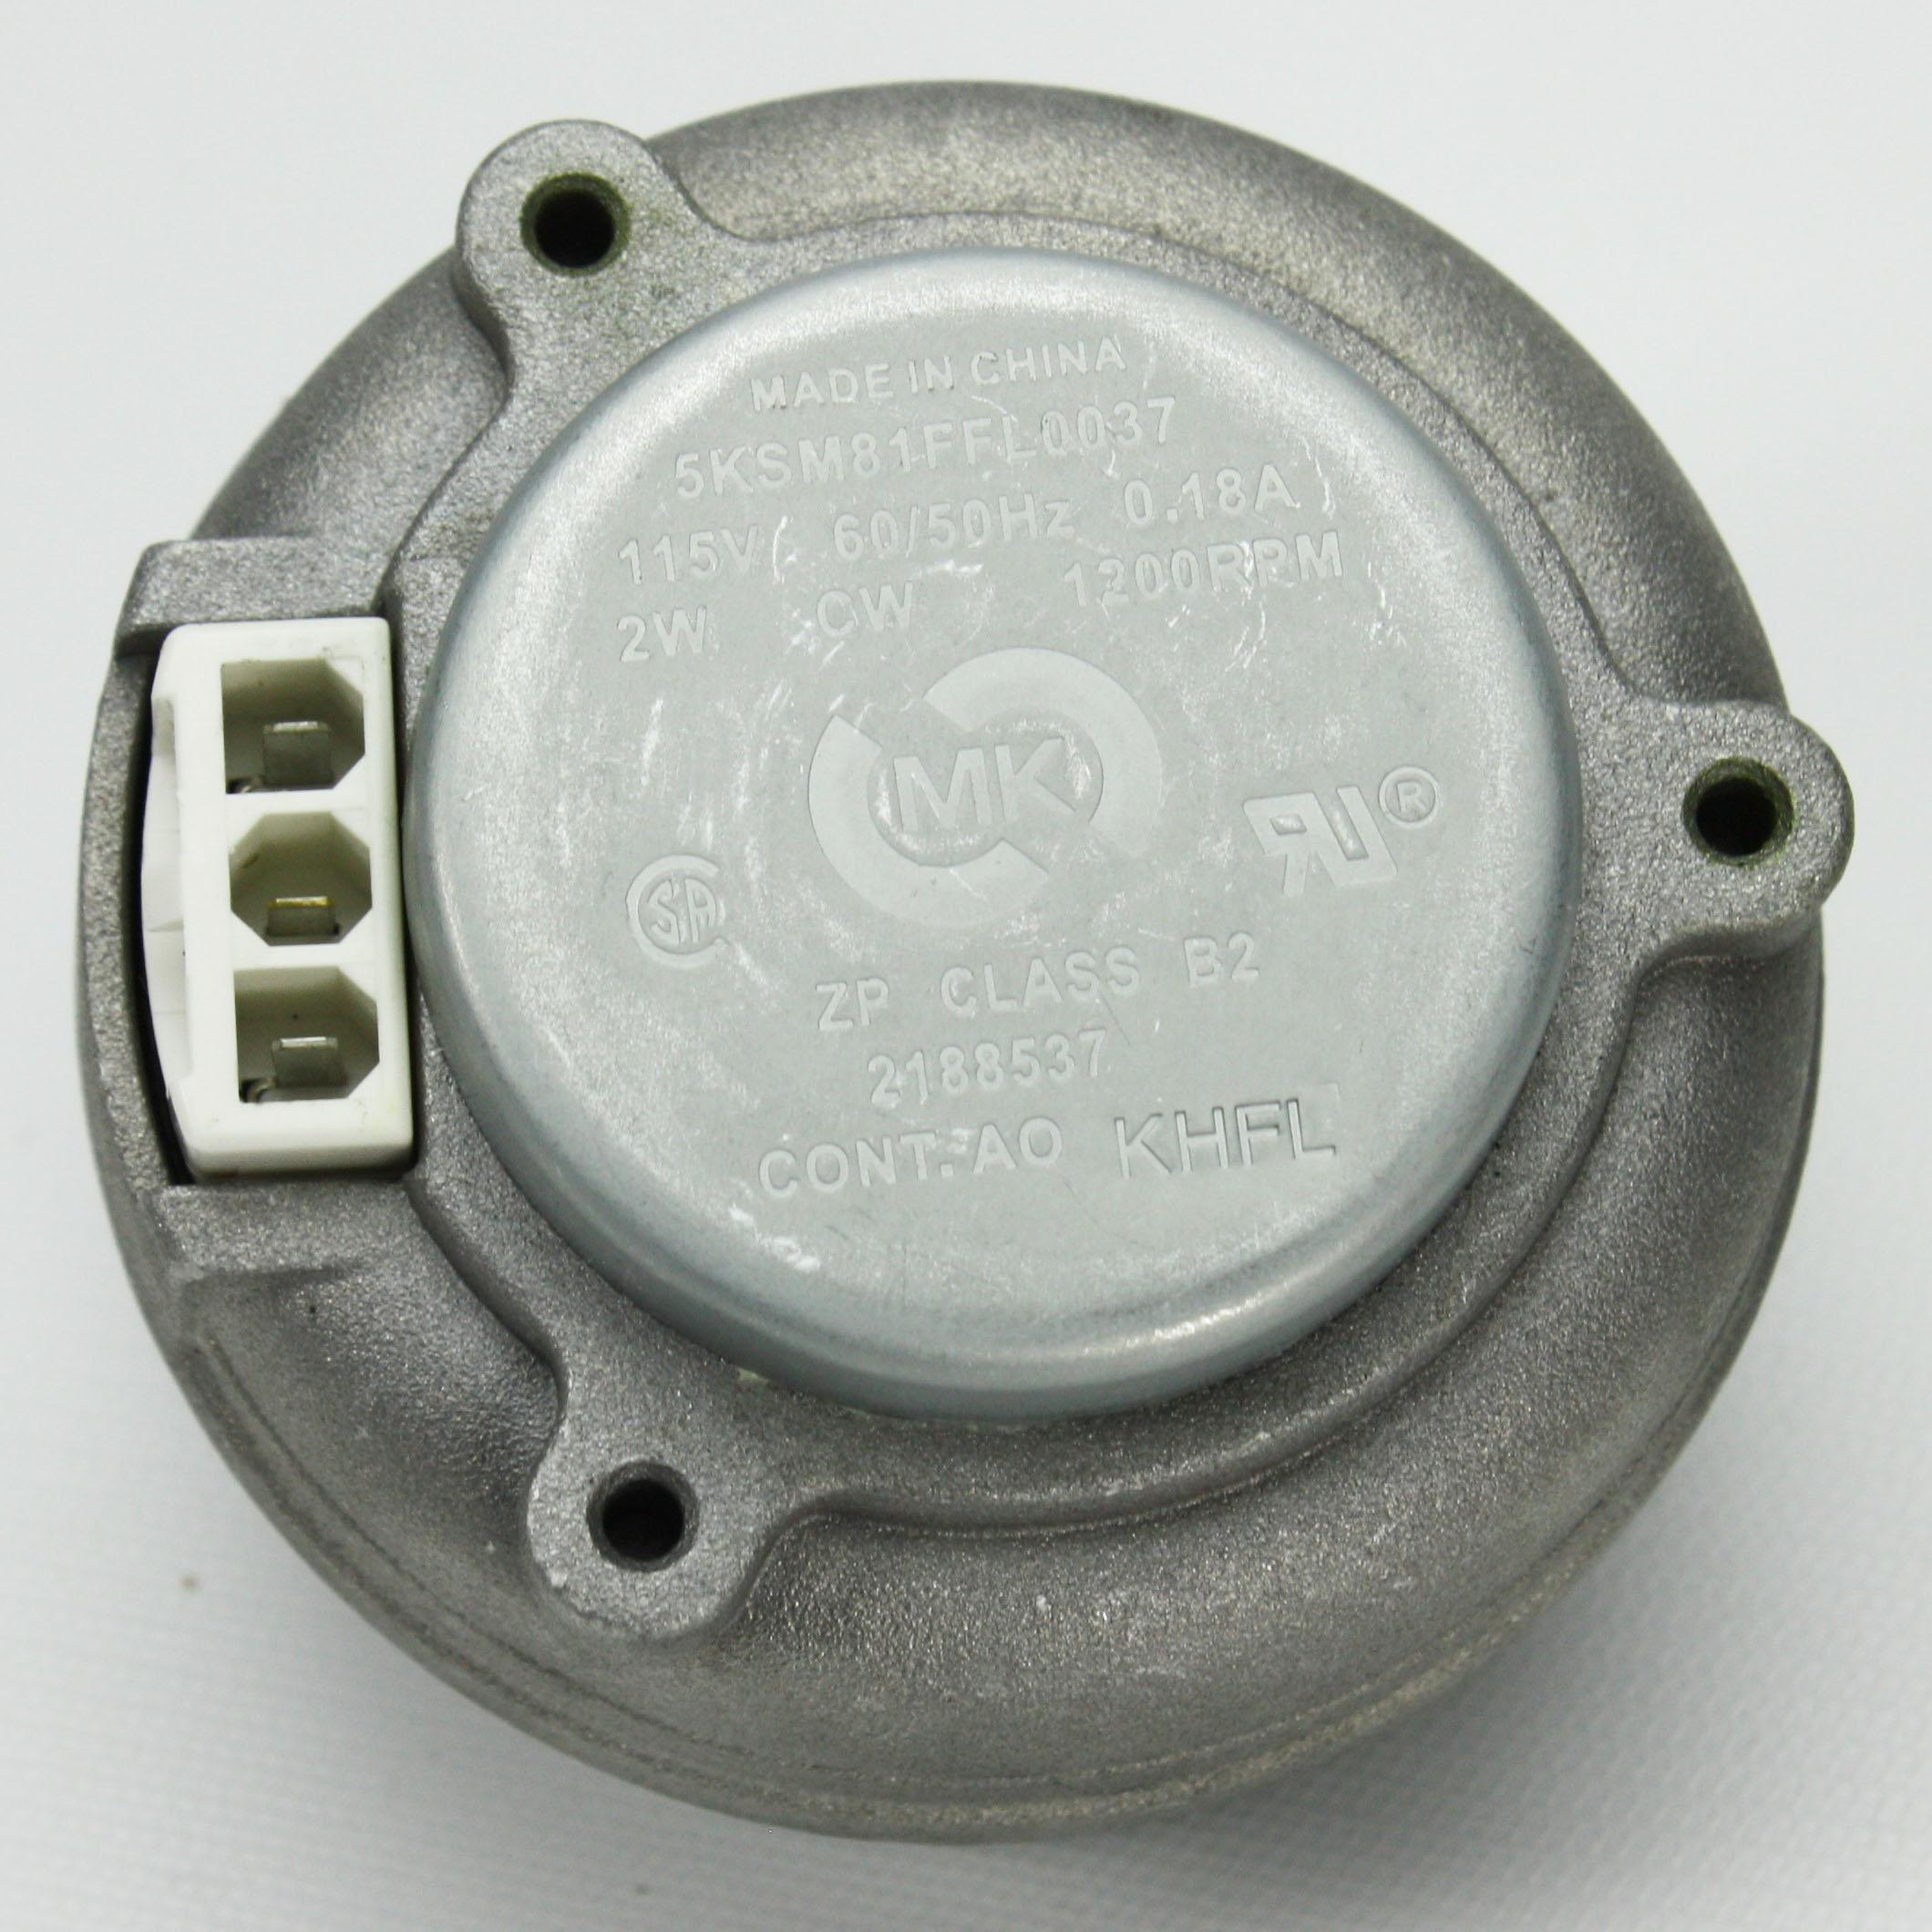 Genuine Oem W10822259 Whirlpool Kitchenaid Refrigerator